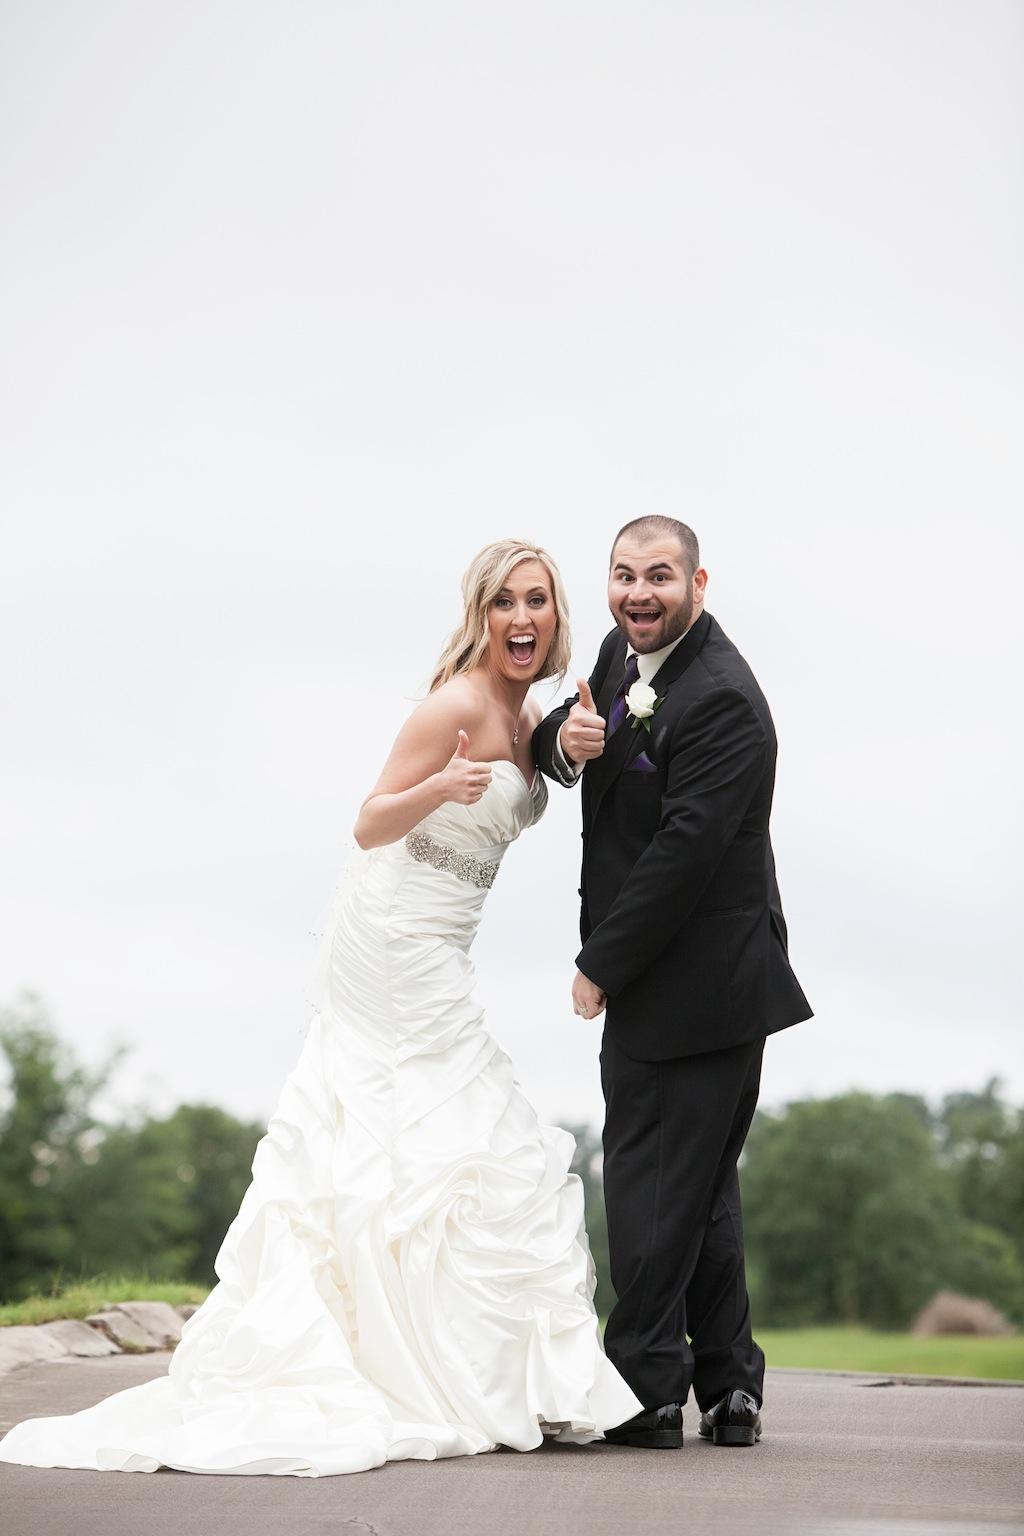 Brooksville Wedding - Purple, Silver & Ivory Wedding at Southern Hills Plantation Club - Brooksville Wedding Photographer Blue Lane Studios (40)